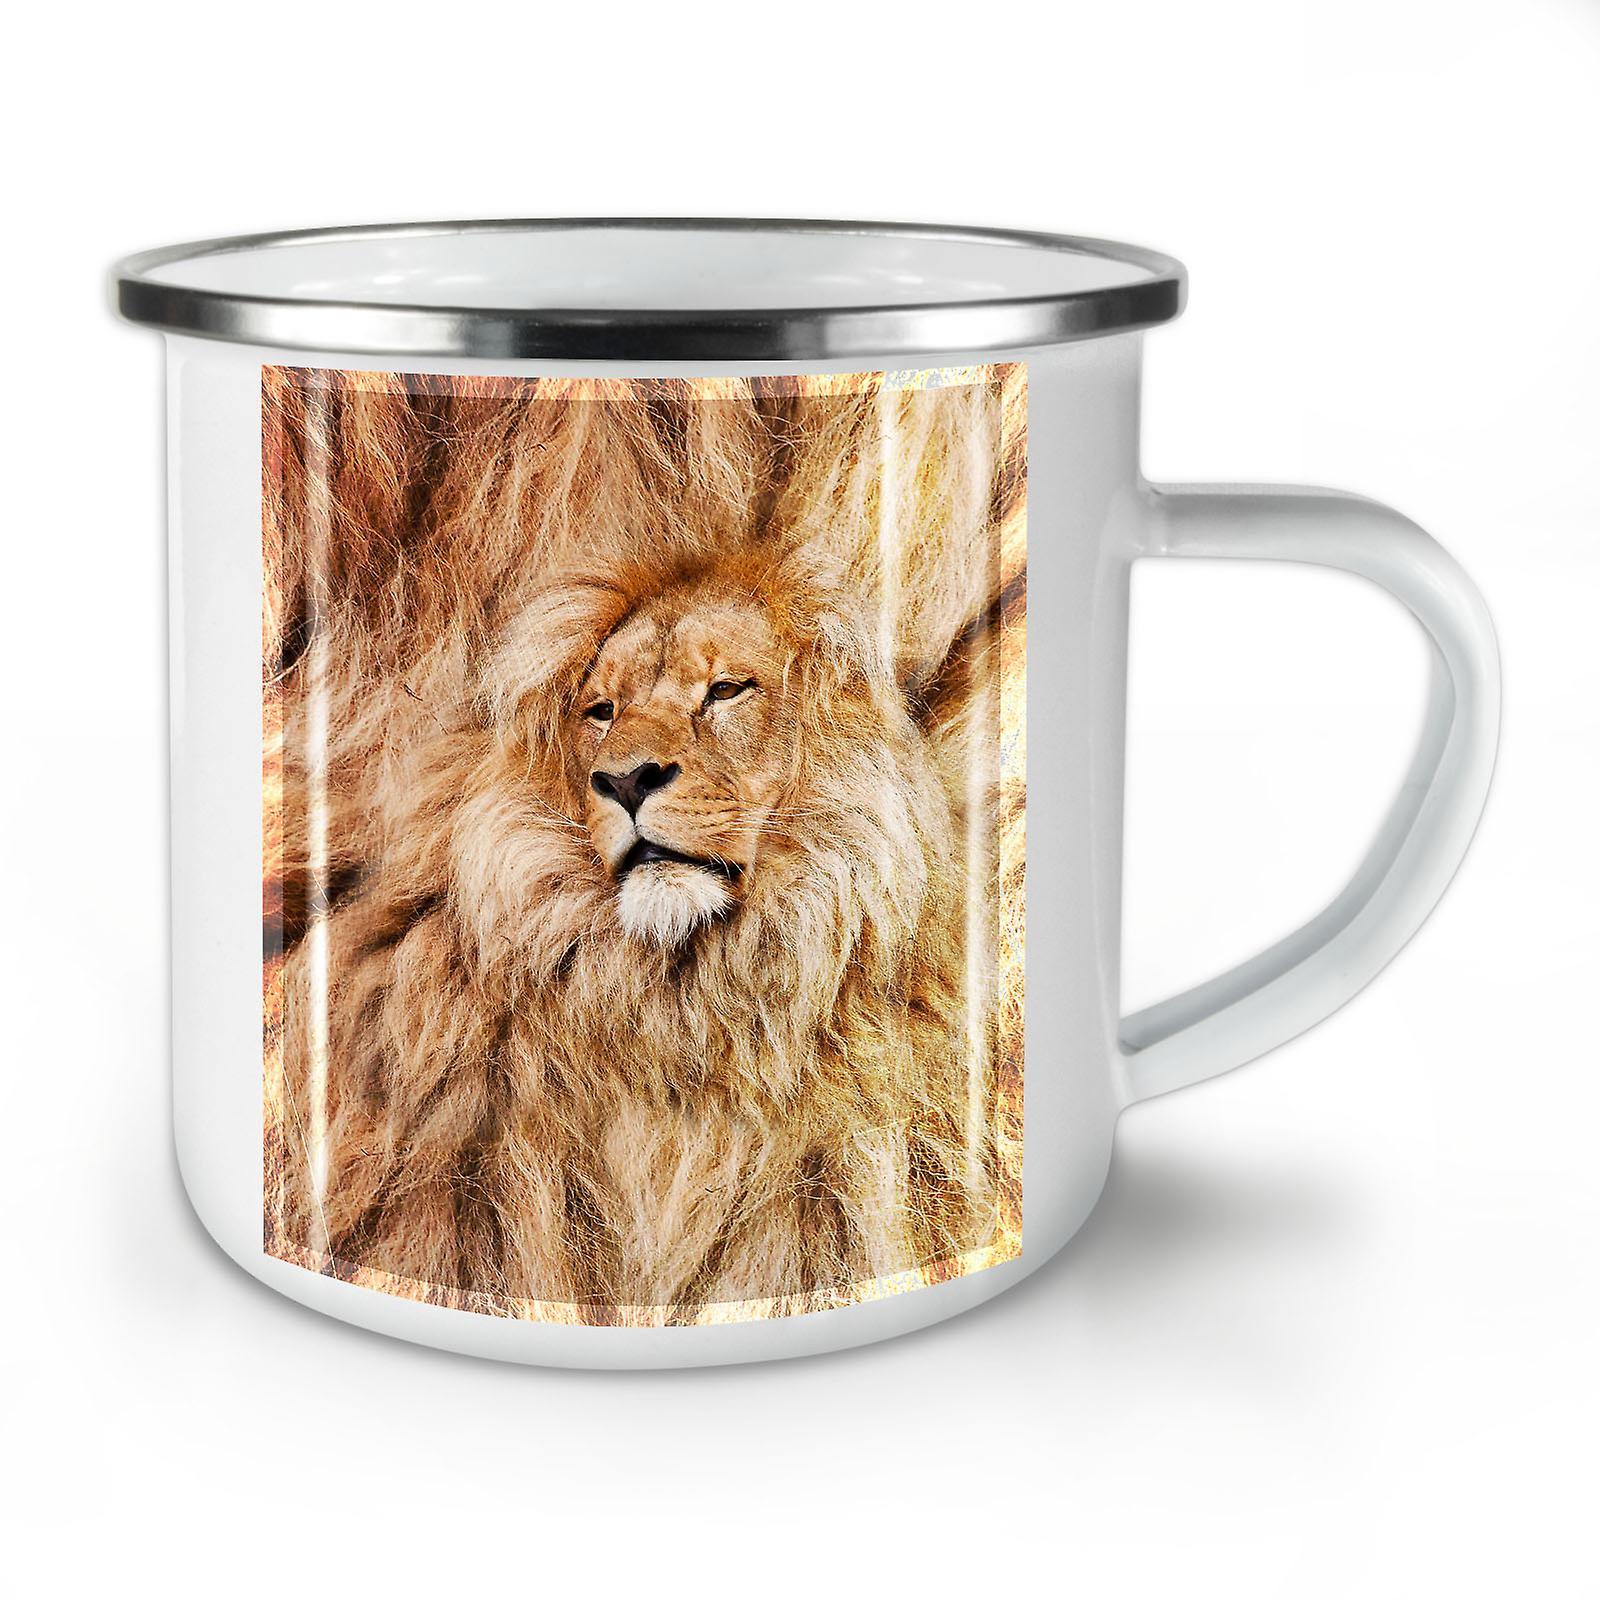 Nouveau Café Whitetea OzWellcoda Émail Mug10 Beast Lion Big Cat P8kOn0w